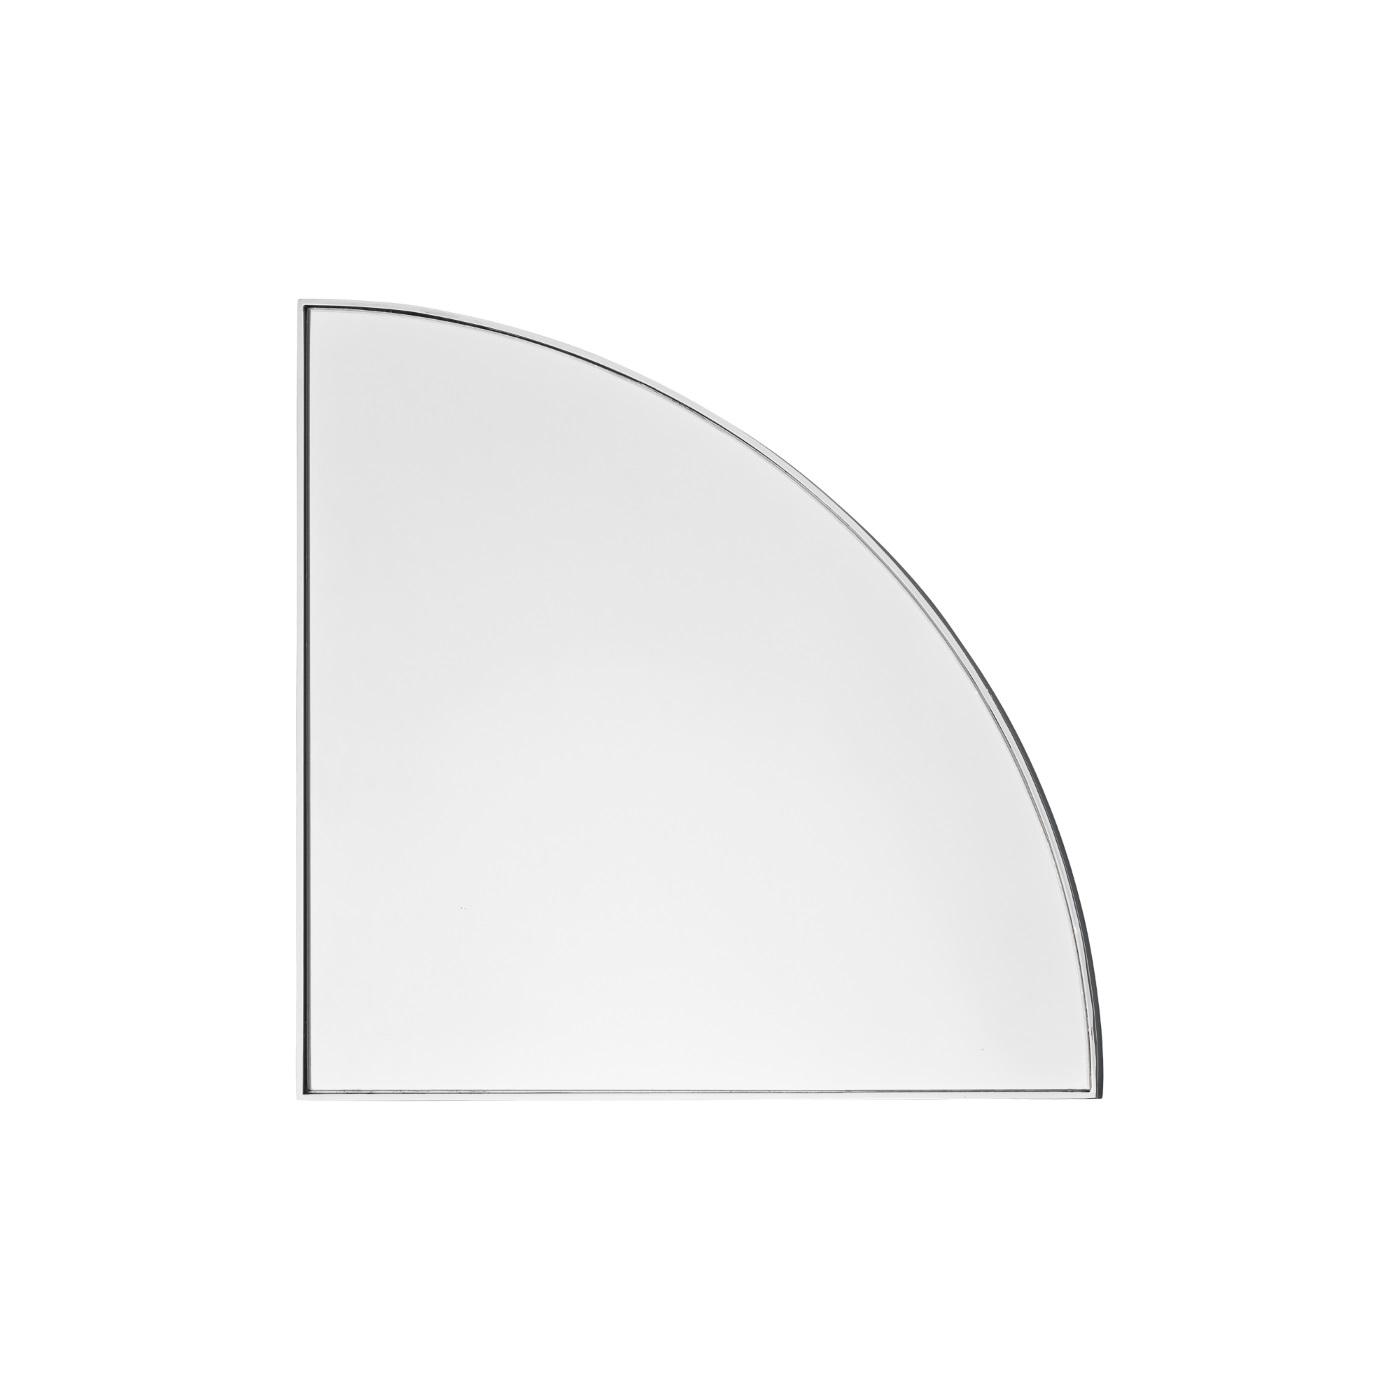 Spegel UNITY kvarts cirkel silver, AYTM